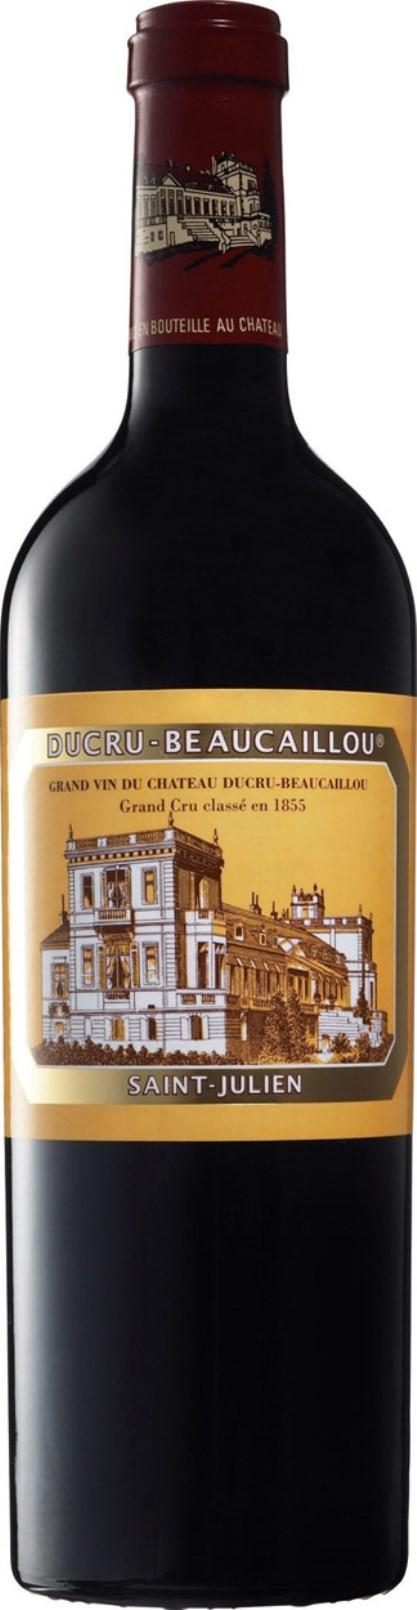 Chateau Ducru Beaucaillou 2012, Saint Julien